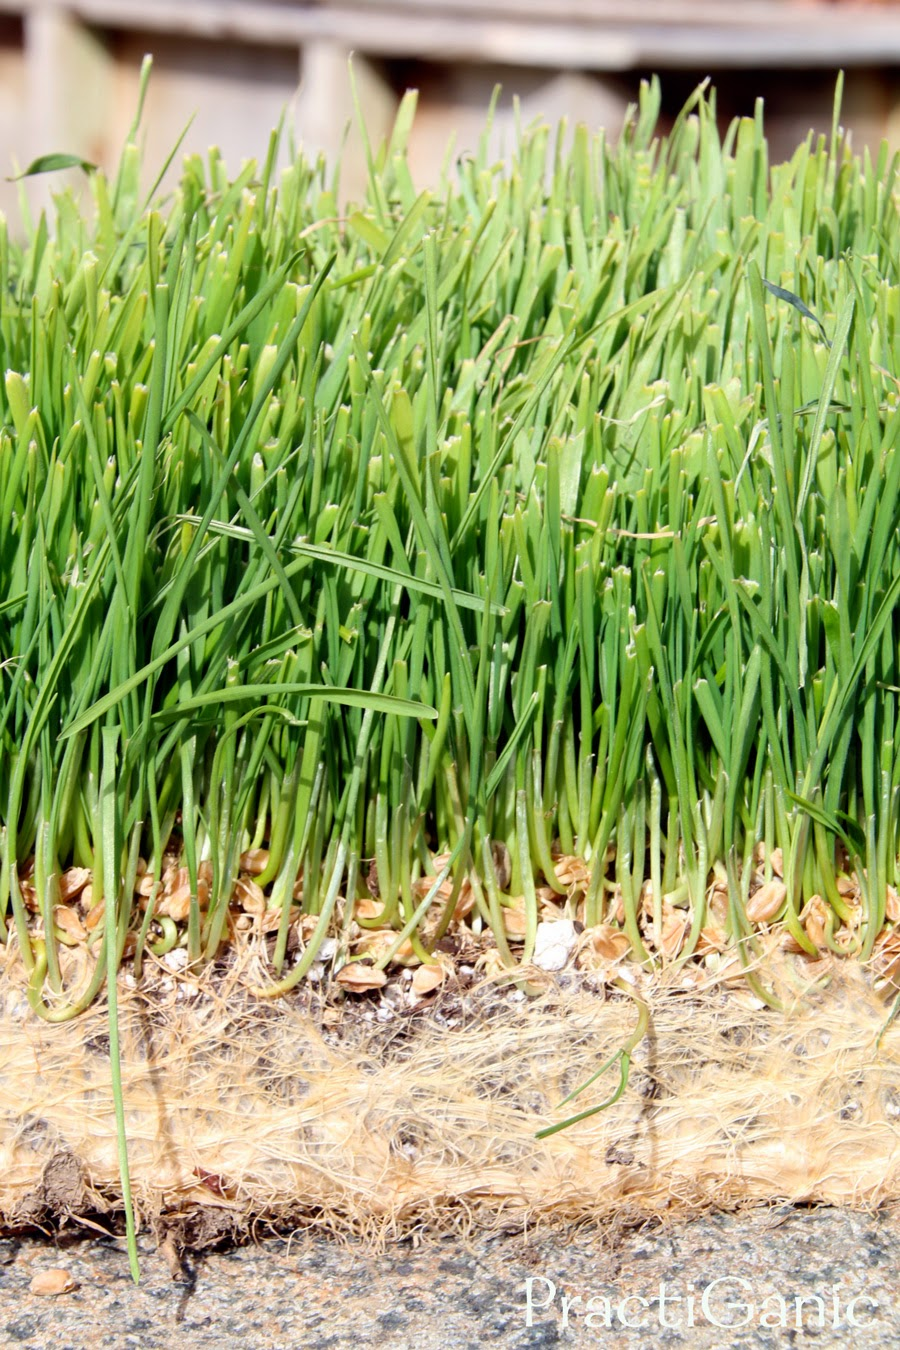 Why I Love Wheatgrass